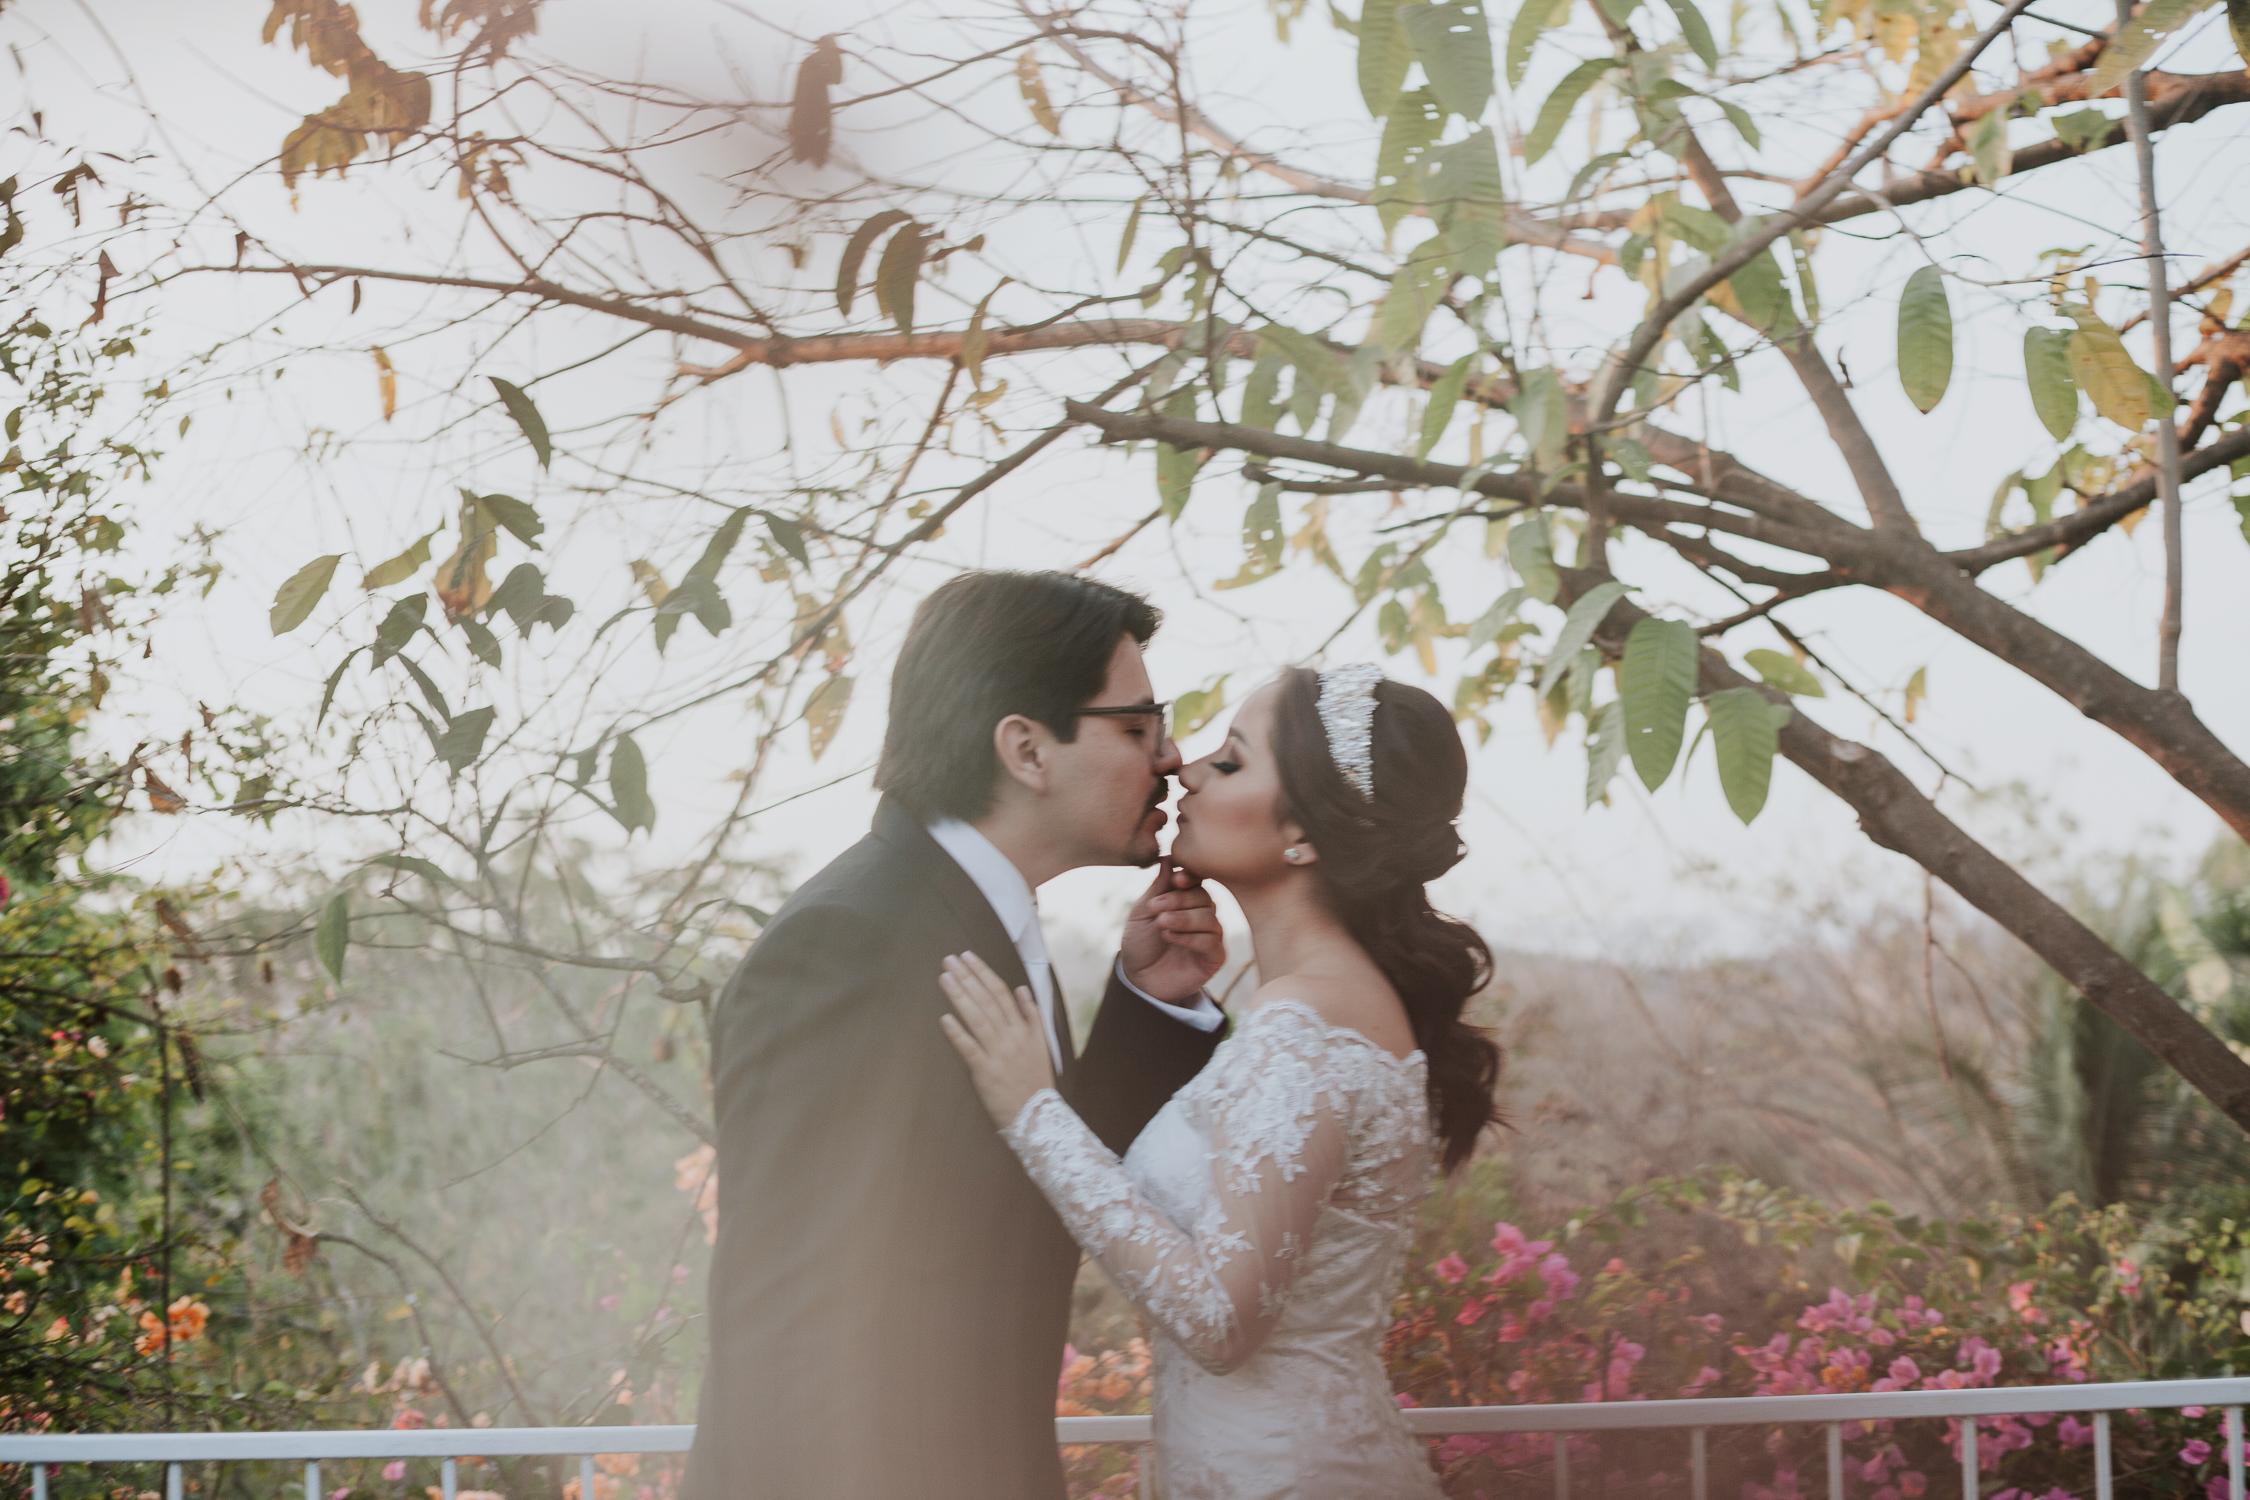 Michelle-Agurto-Fotografia-Bodas-Ecuador-Destination-Wedding-Photographer-Pauli-Edwin-16.JPG